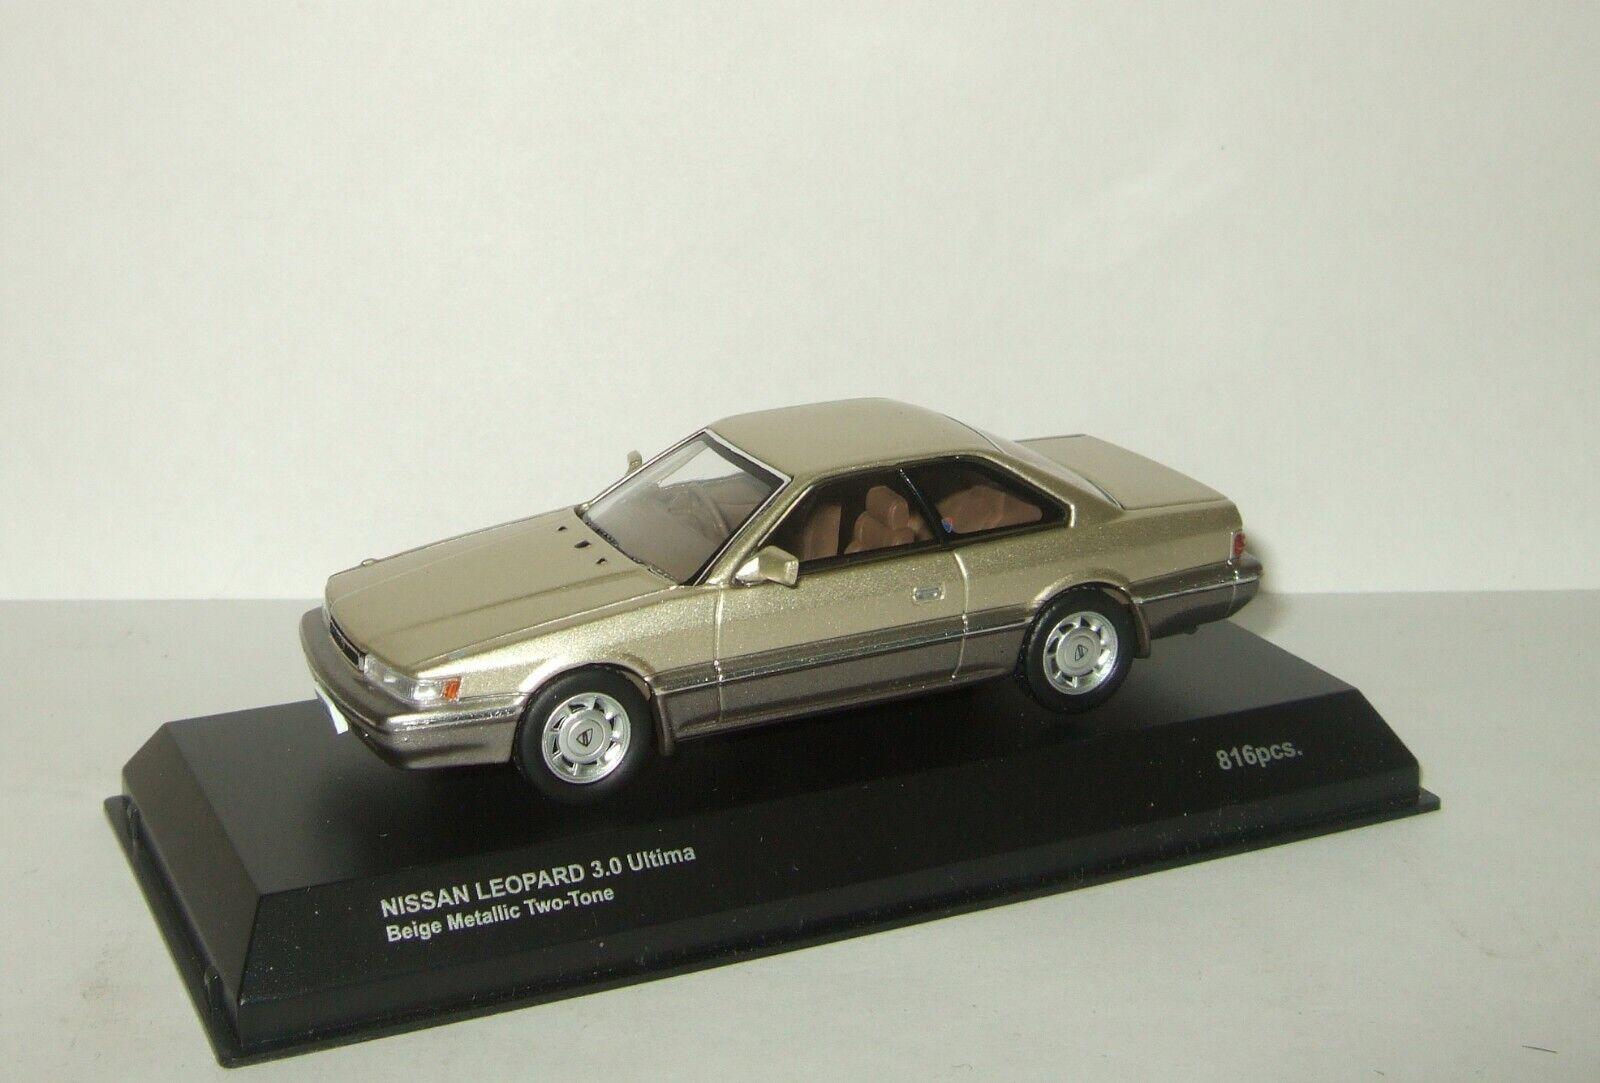 1 43 Kyosho Nissan Leopard 3.0 Ultima 1986